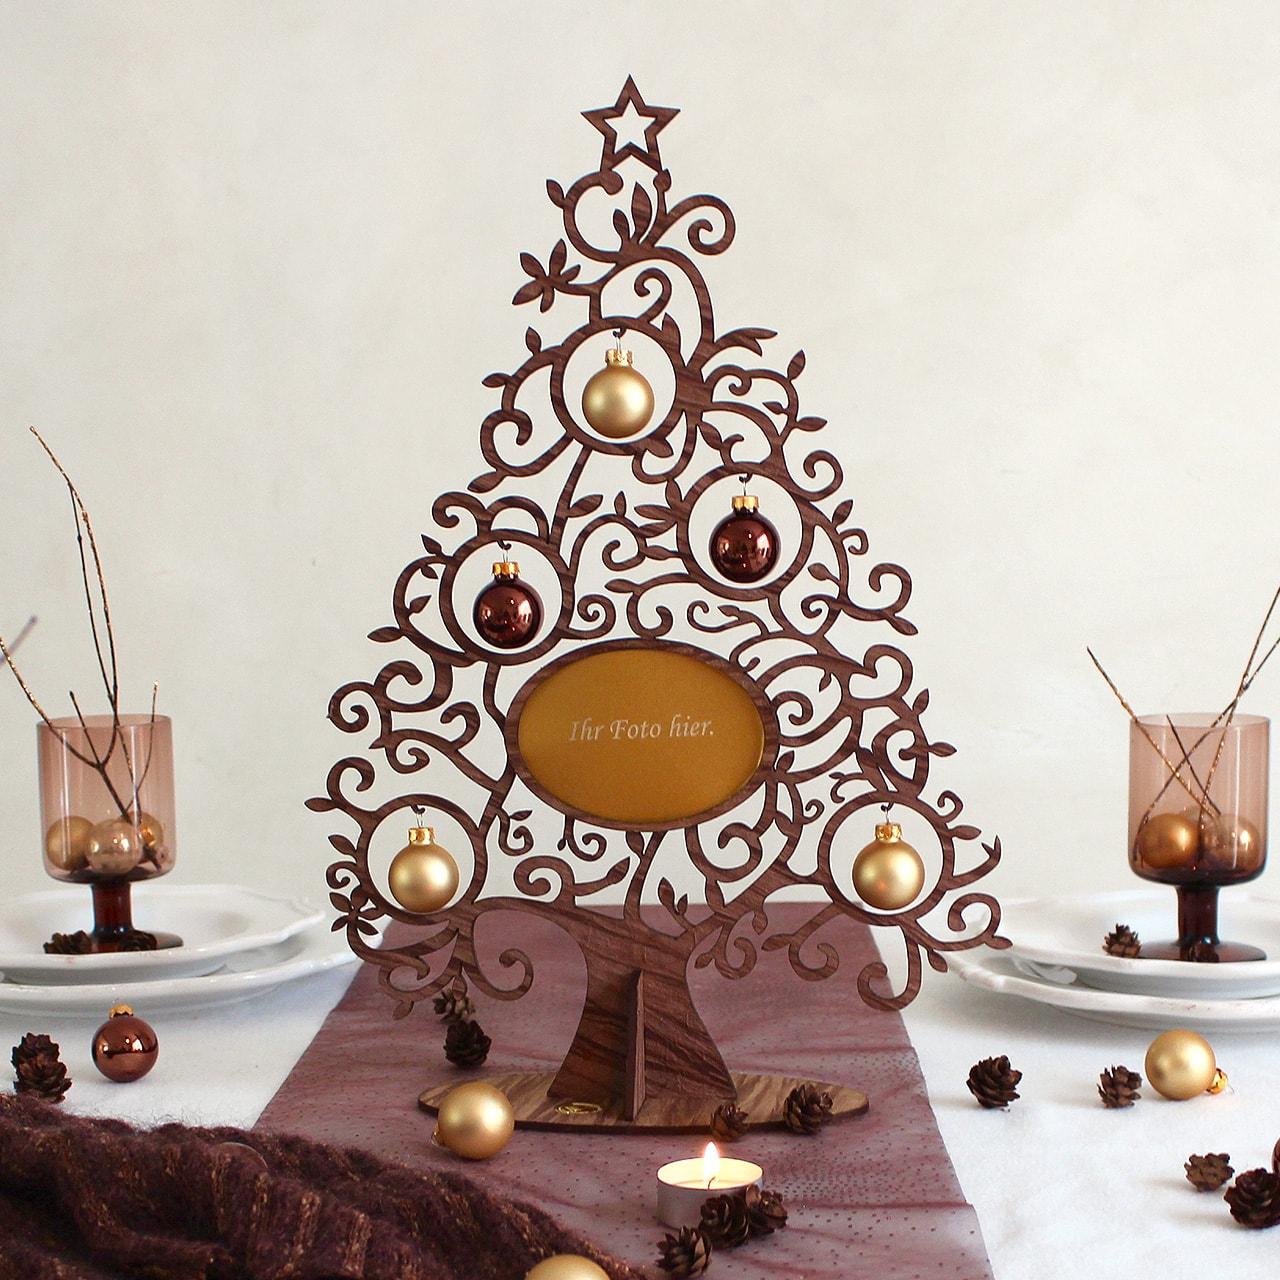 deko weihnachten bilderrahmenbaum tischdeko geschenke. Black Bedroom Furniture Sets. Home Design Ideas